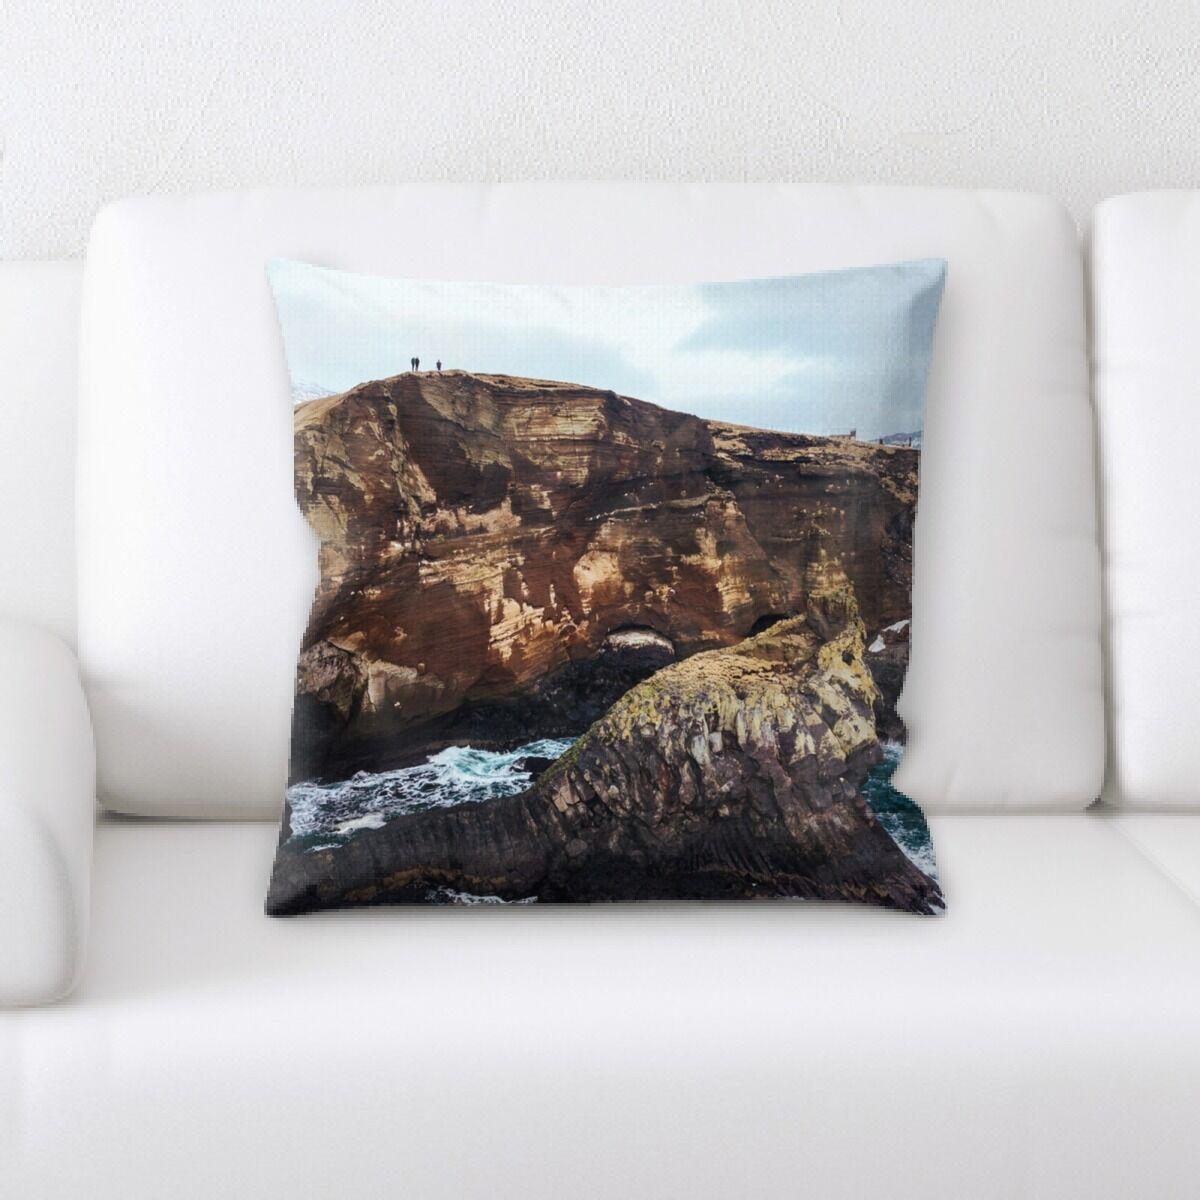 Milligan Mountain and Cliffs (187) Throw Pillow